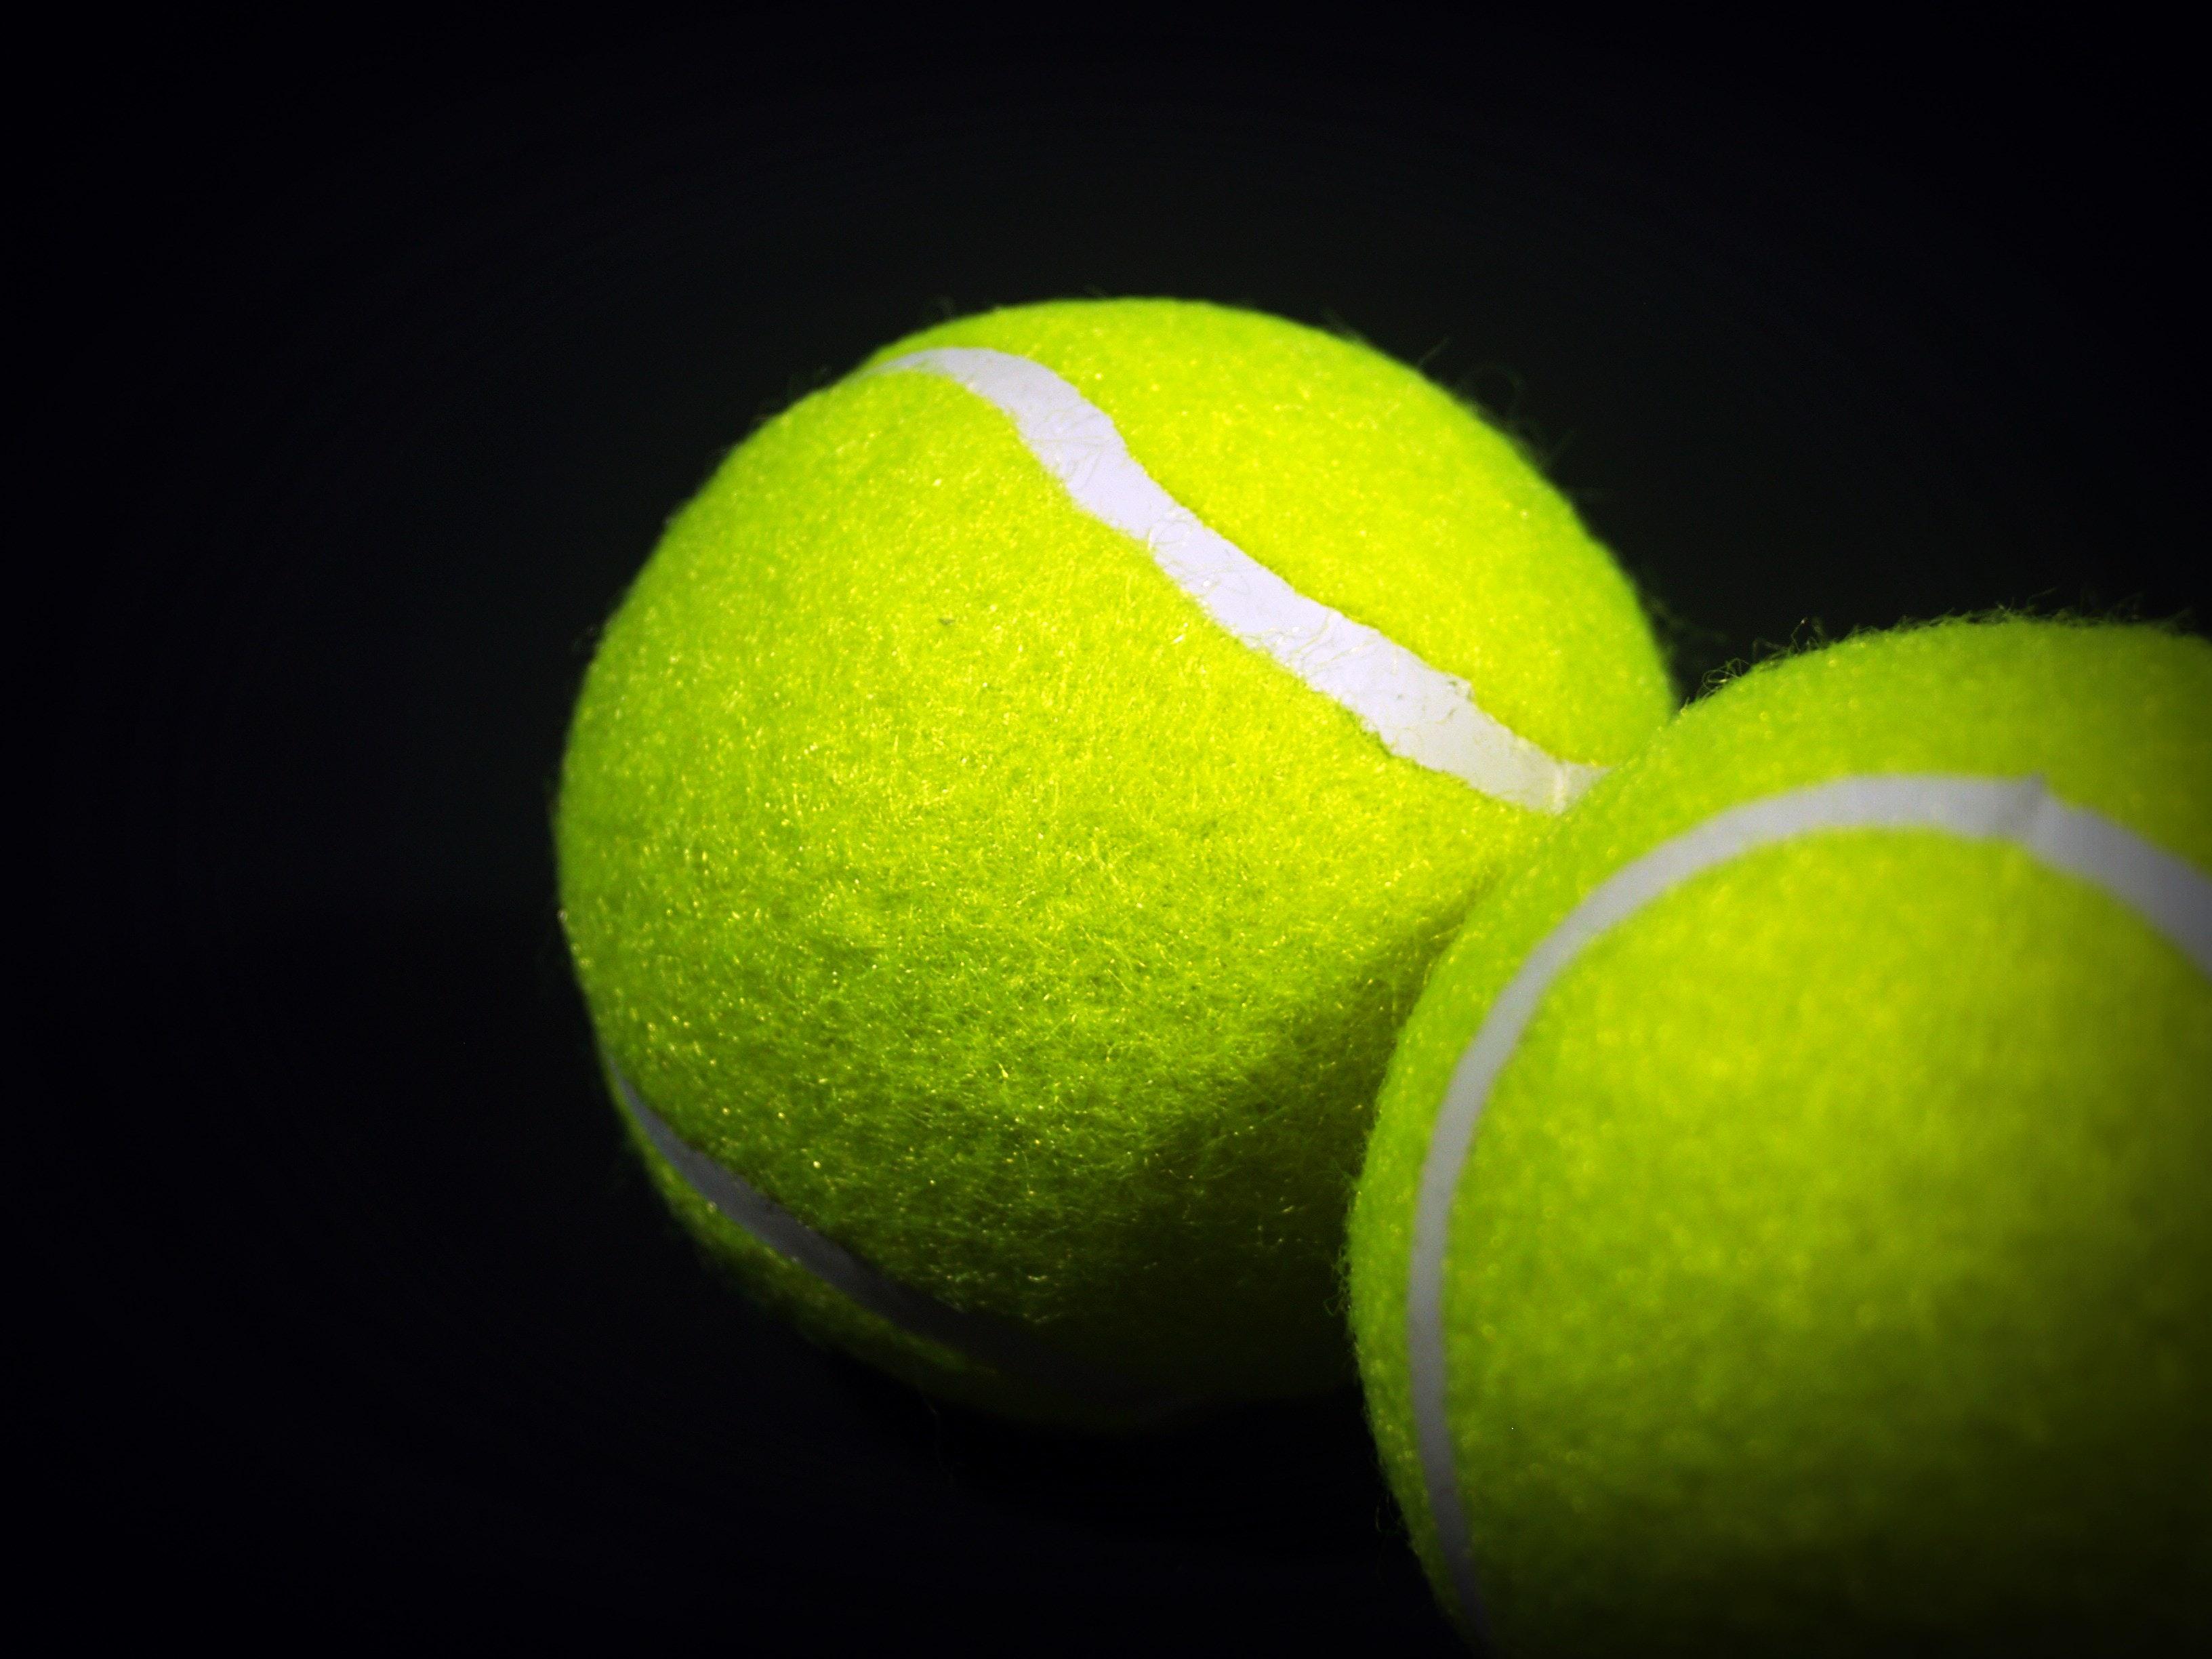 Green Tennis Balls Free Stock Photo